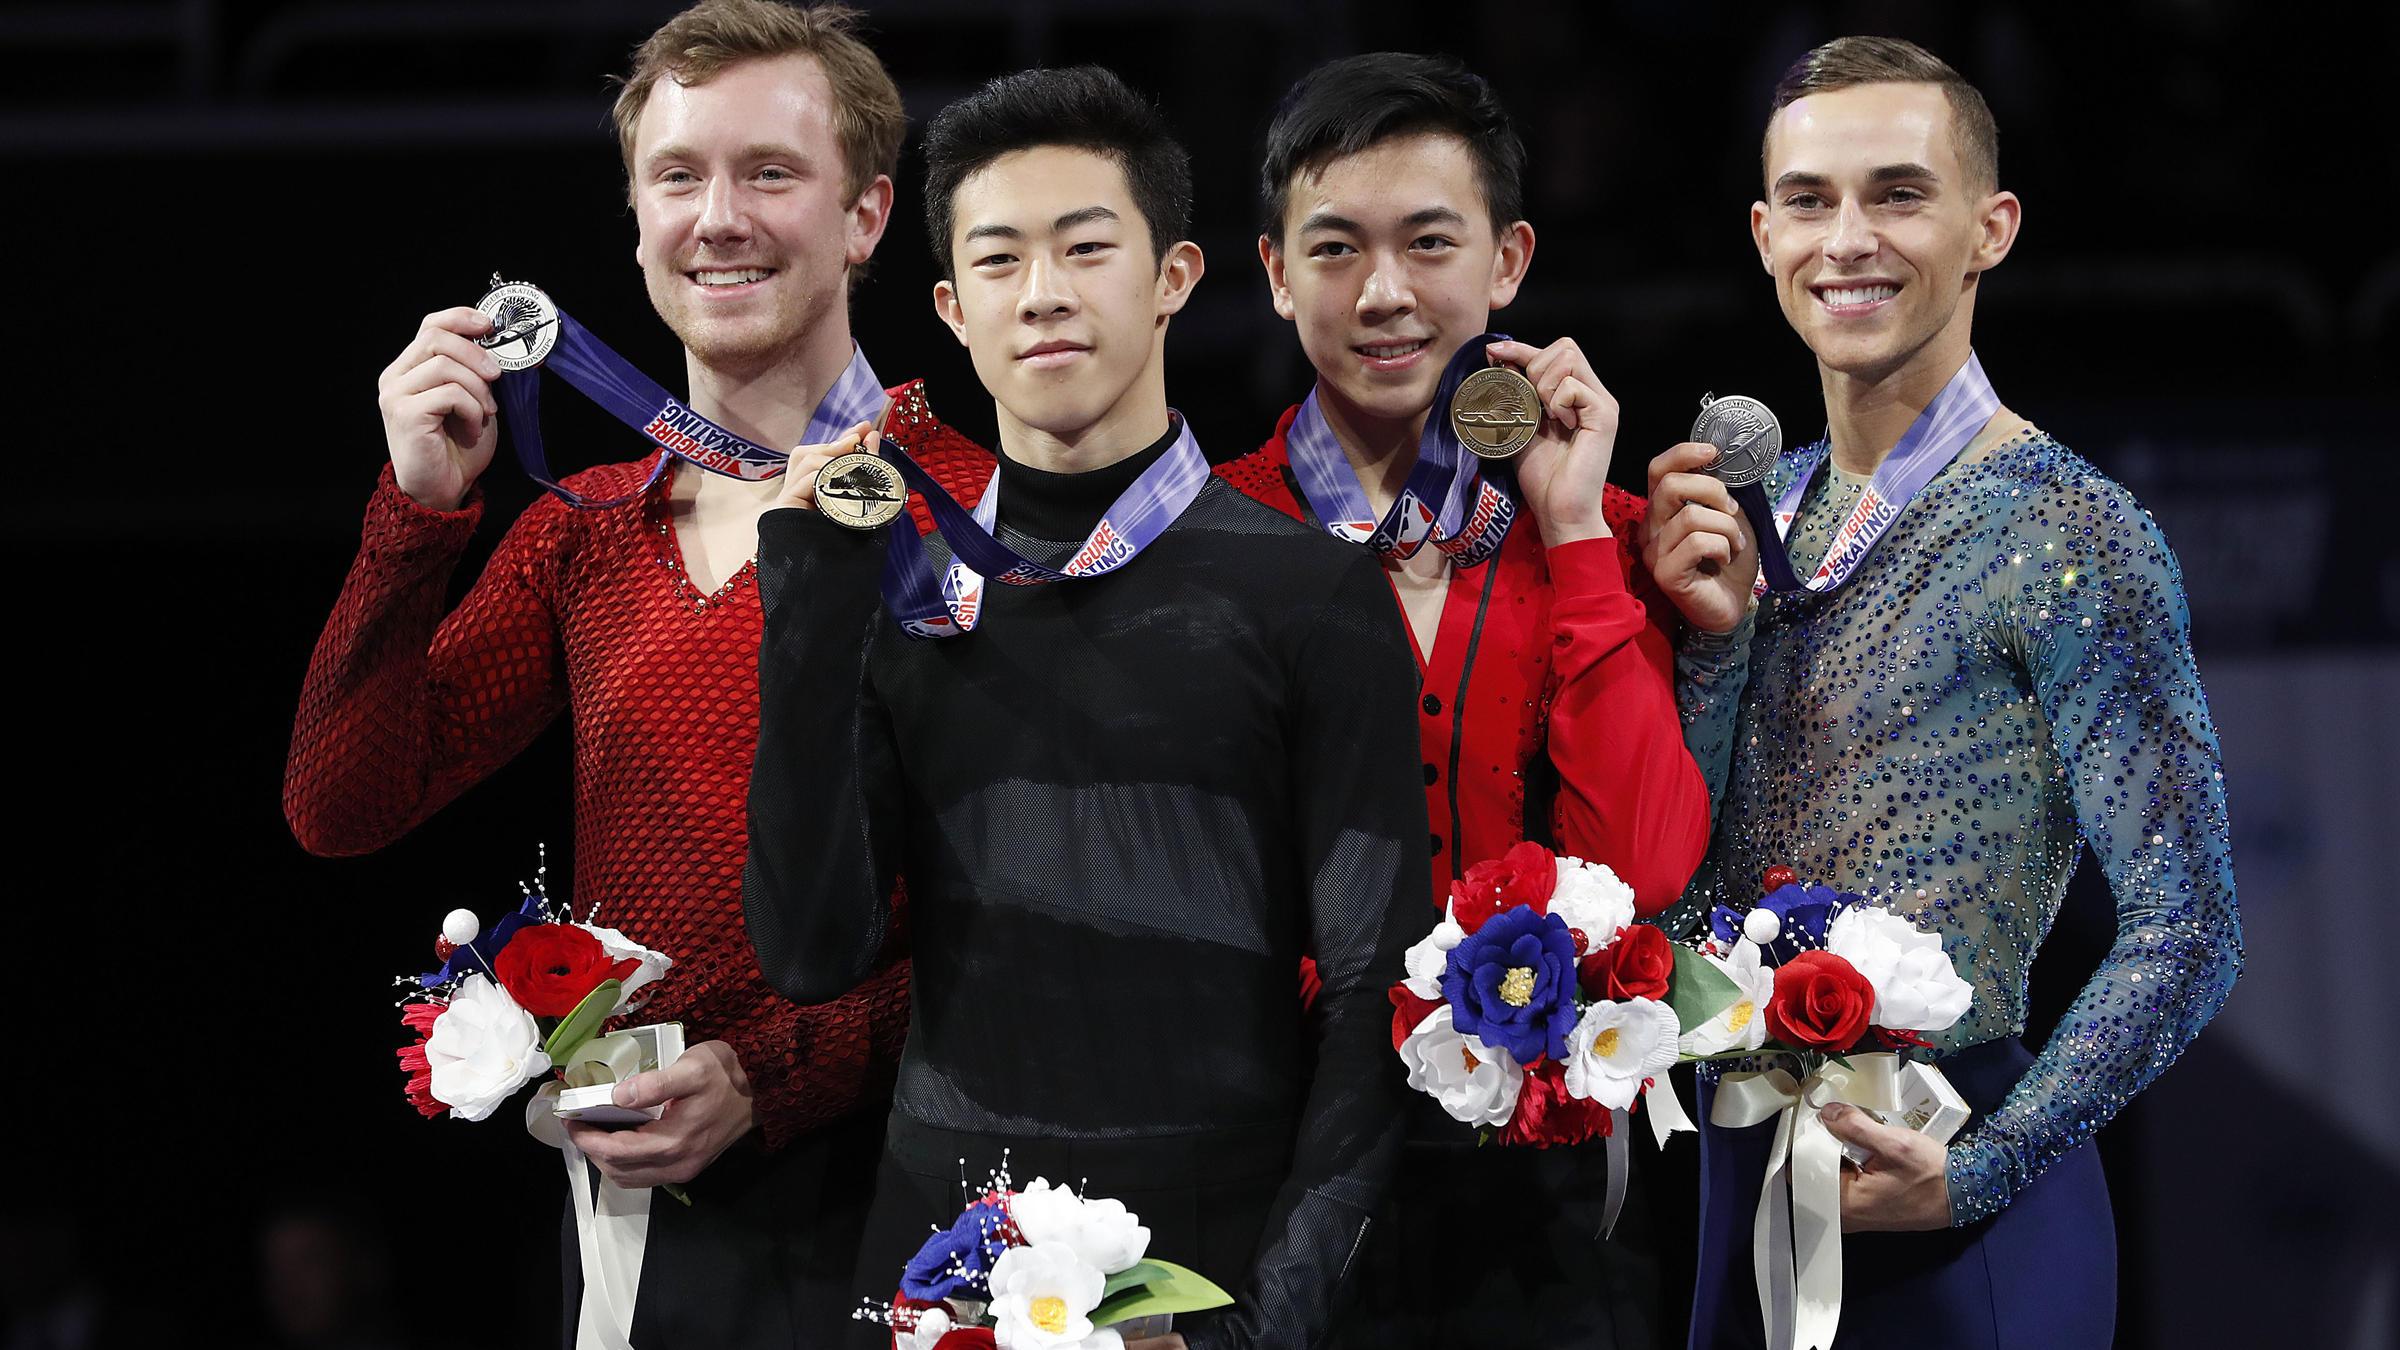 Highland Park's Jason Brown named Olympic alternate in figure skating